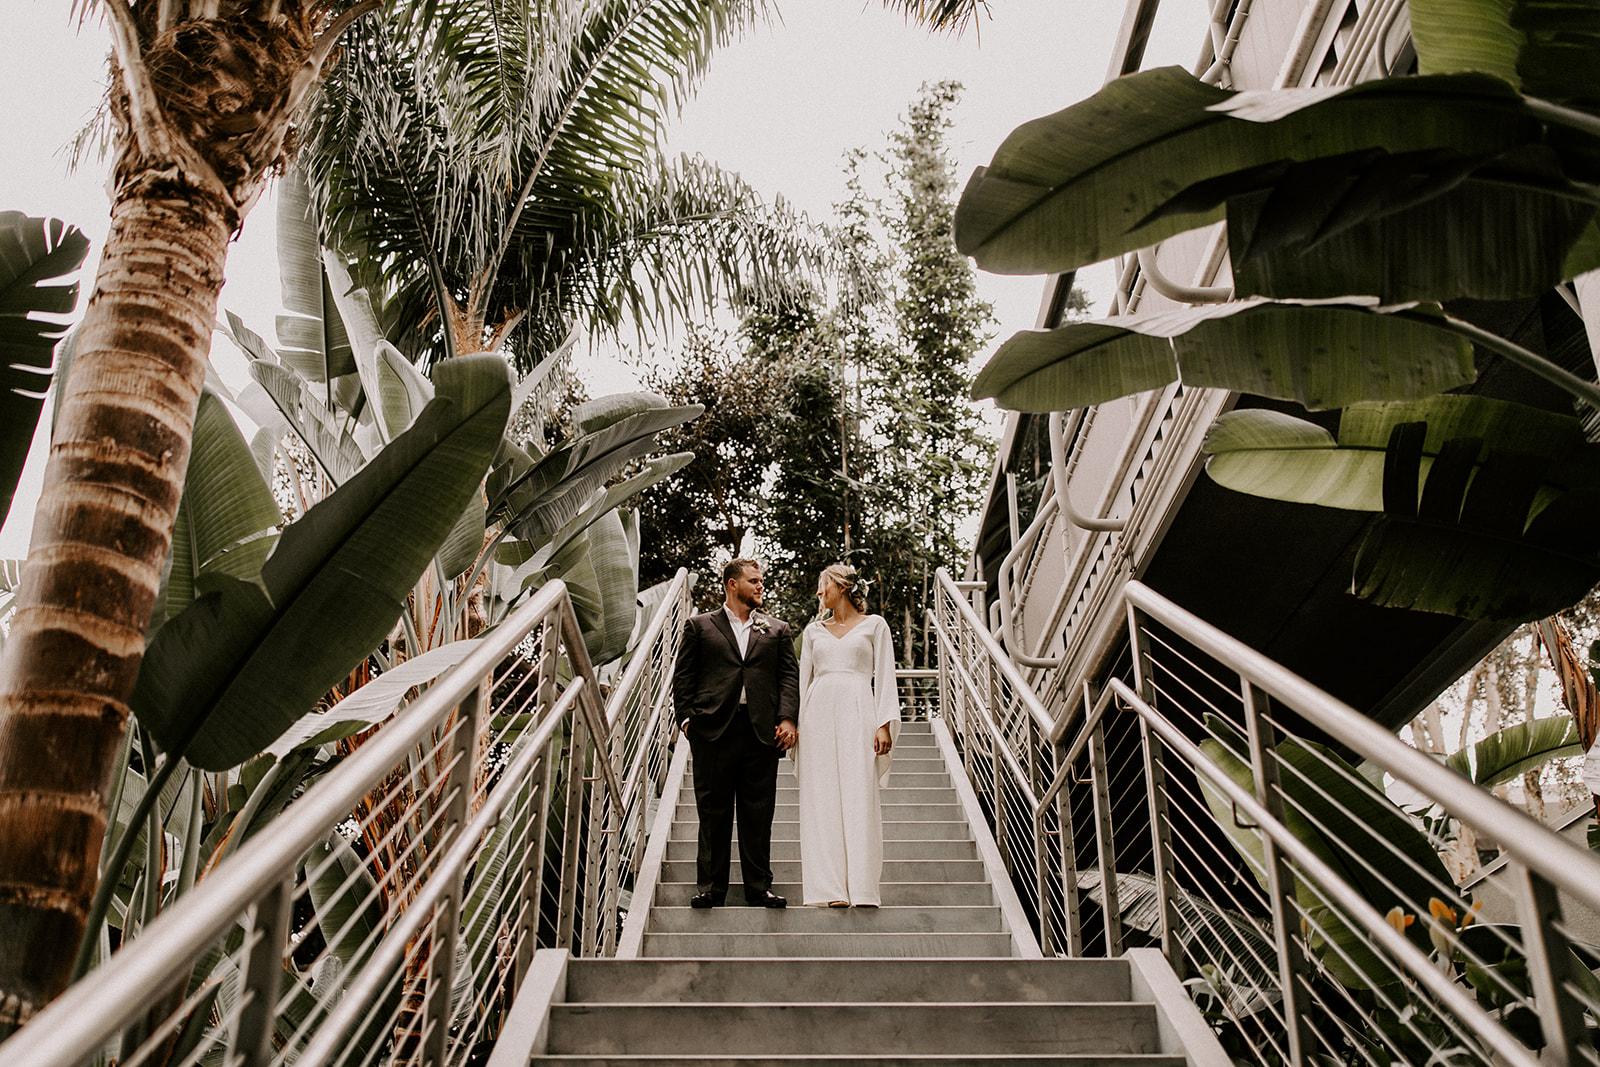 Mckenzie + Trevor The Ultimate Skybox Downtown San Diego Wedding Ellie Cole Photographer-532.jpg